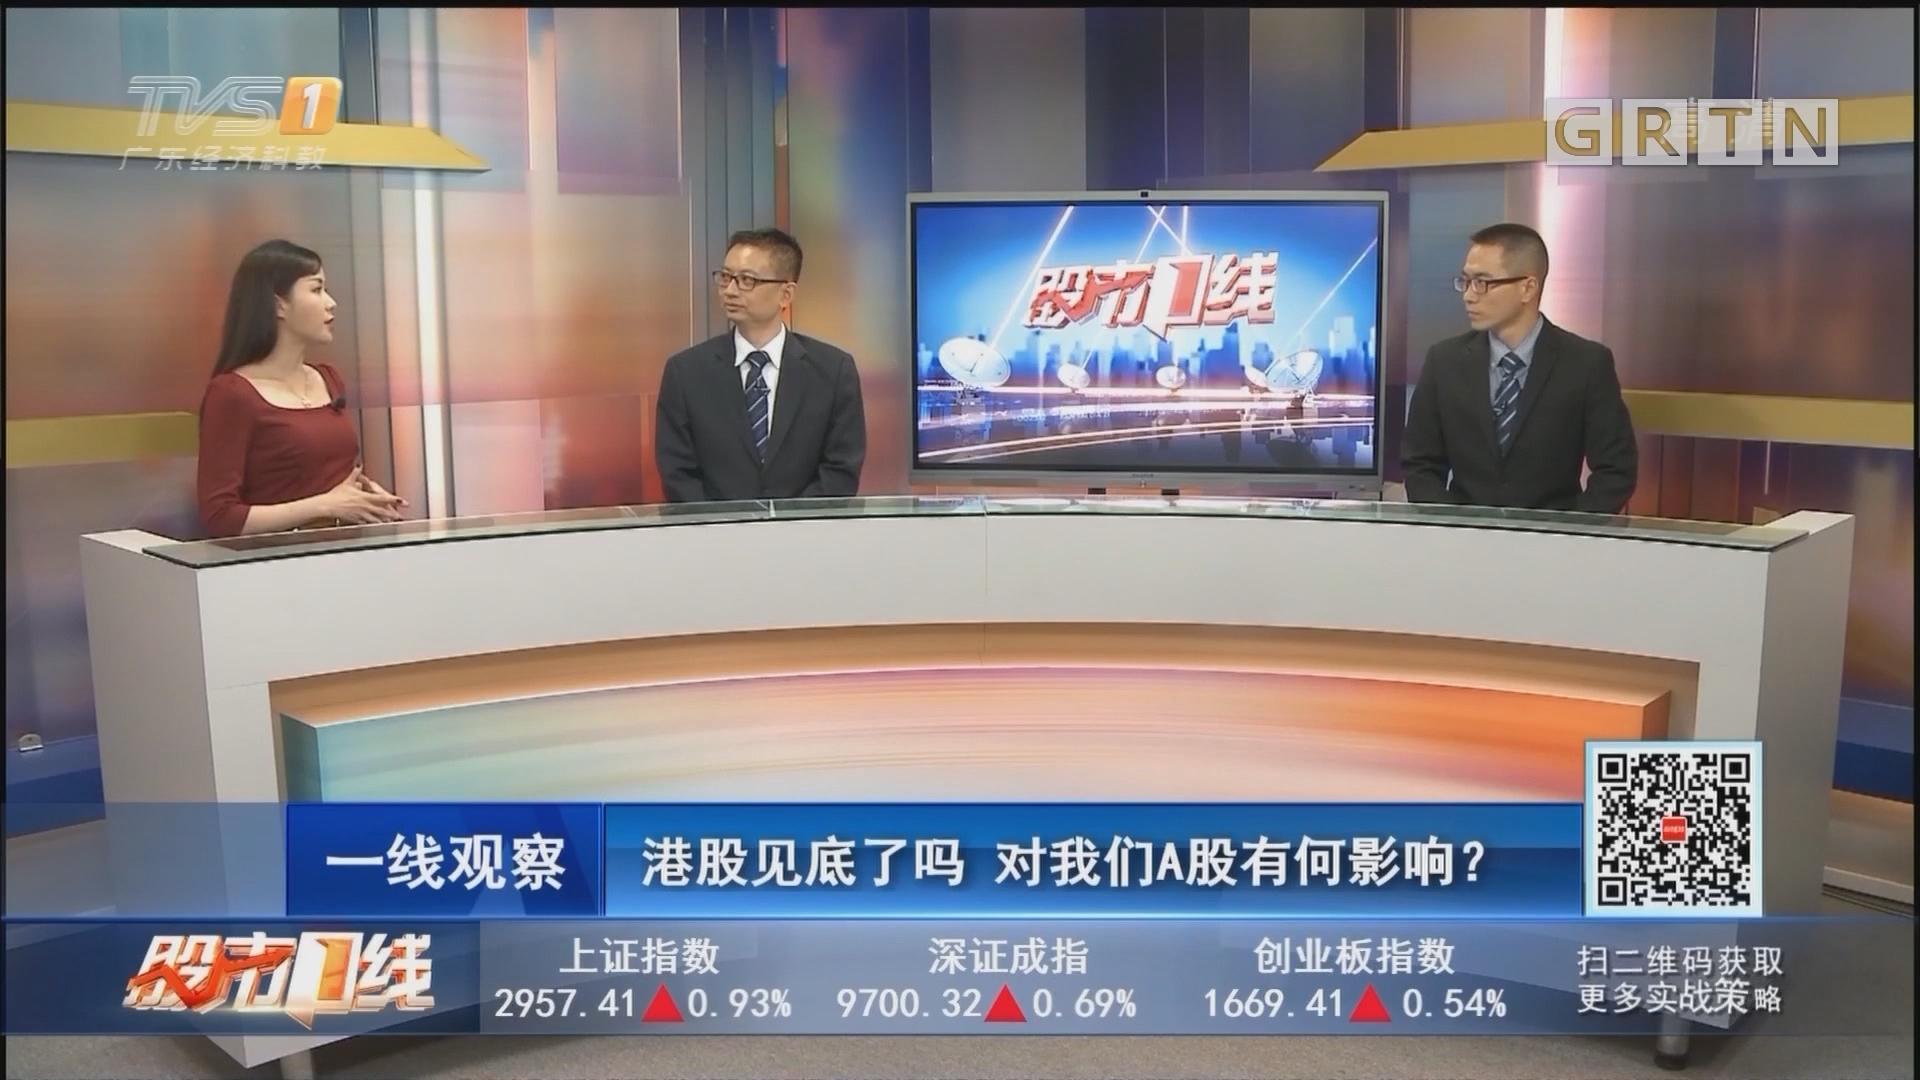 [HD][2019-09-04]股市一线:港股见底了吗 对我们A股有何影响?